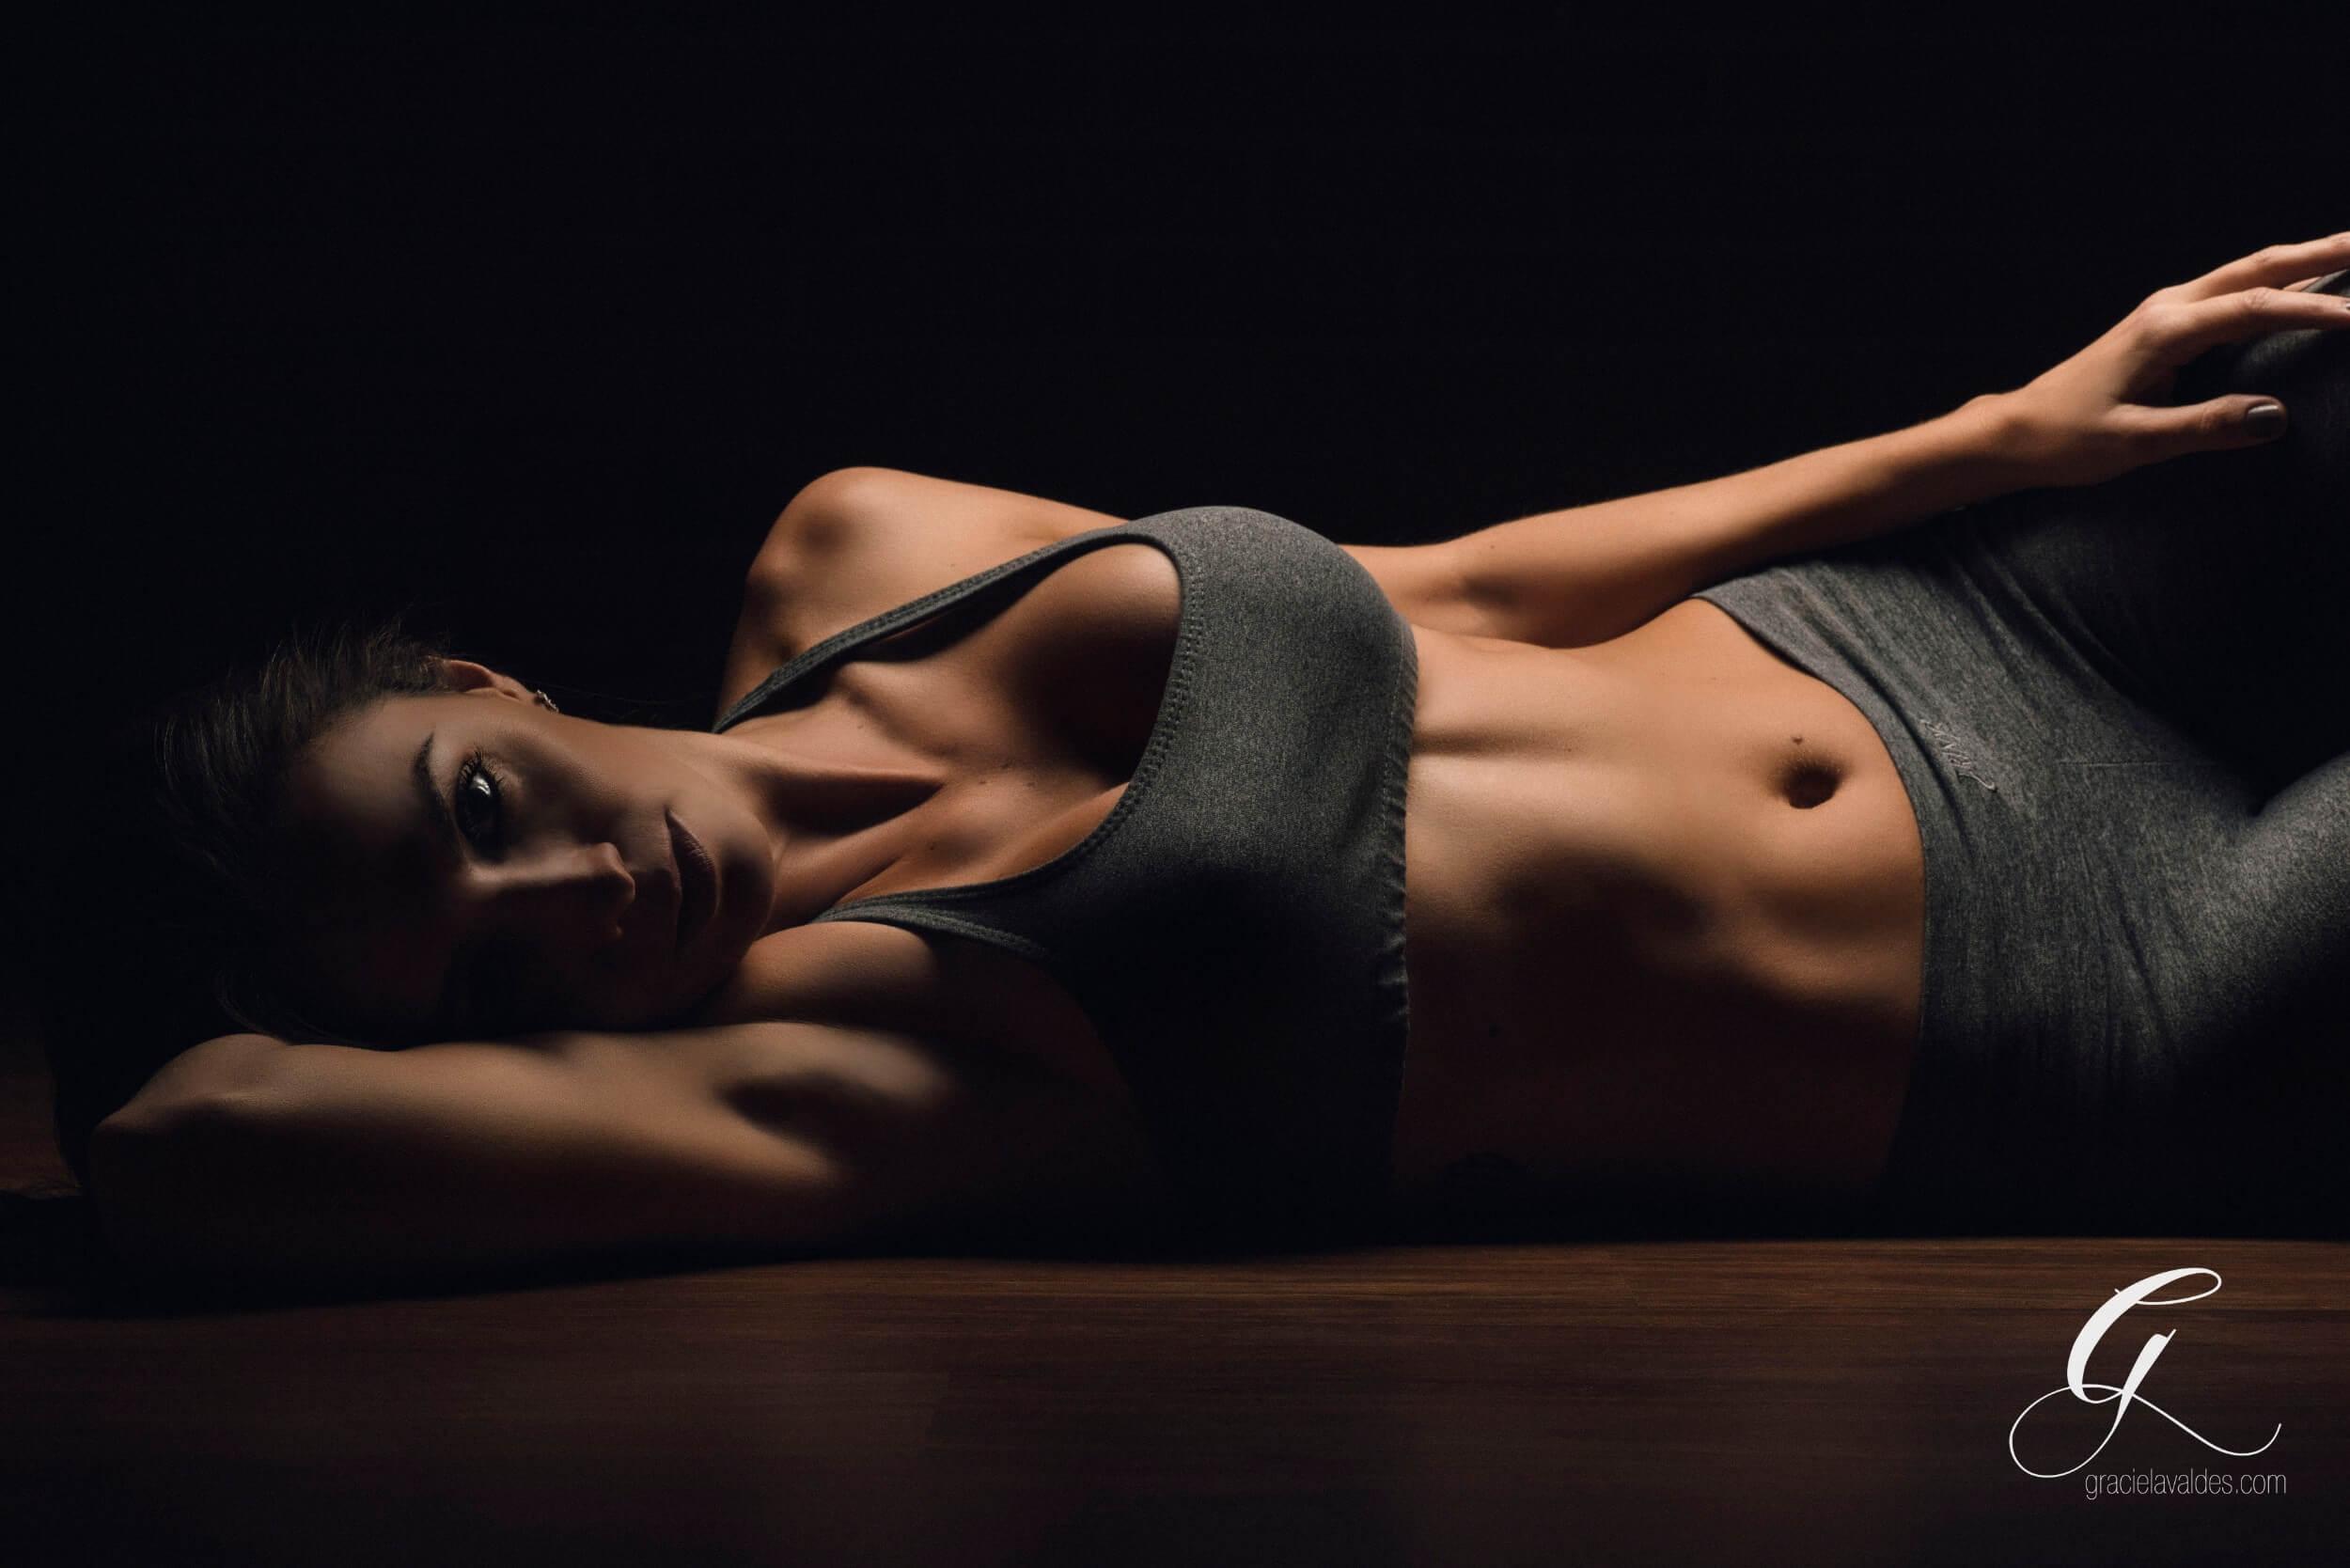 Custom Fitness Institute by Graciela Valdes copy copy.jpg